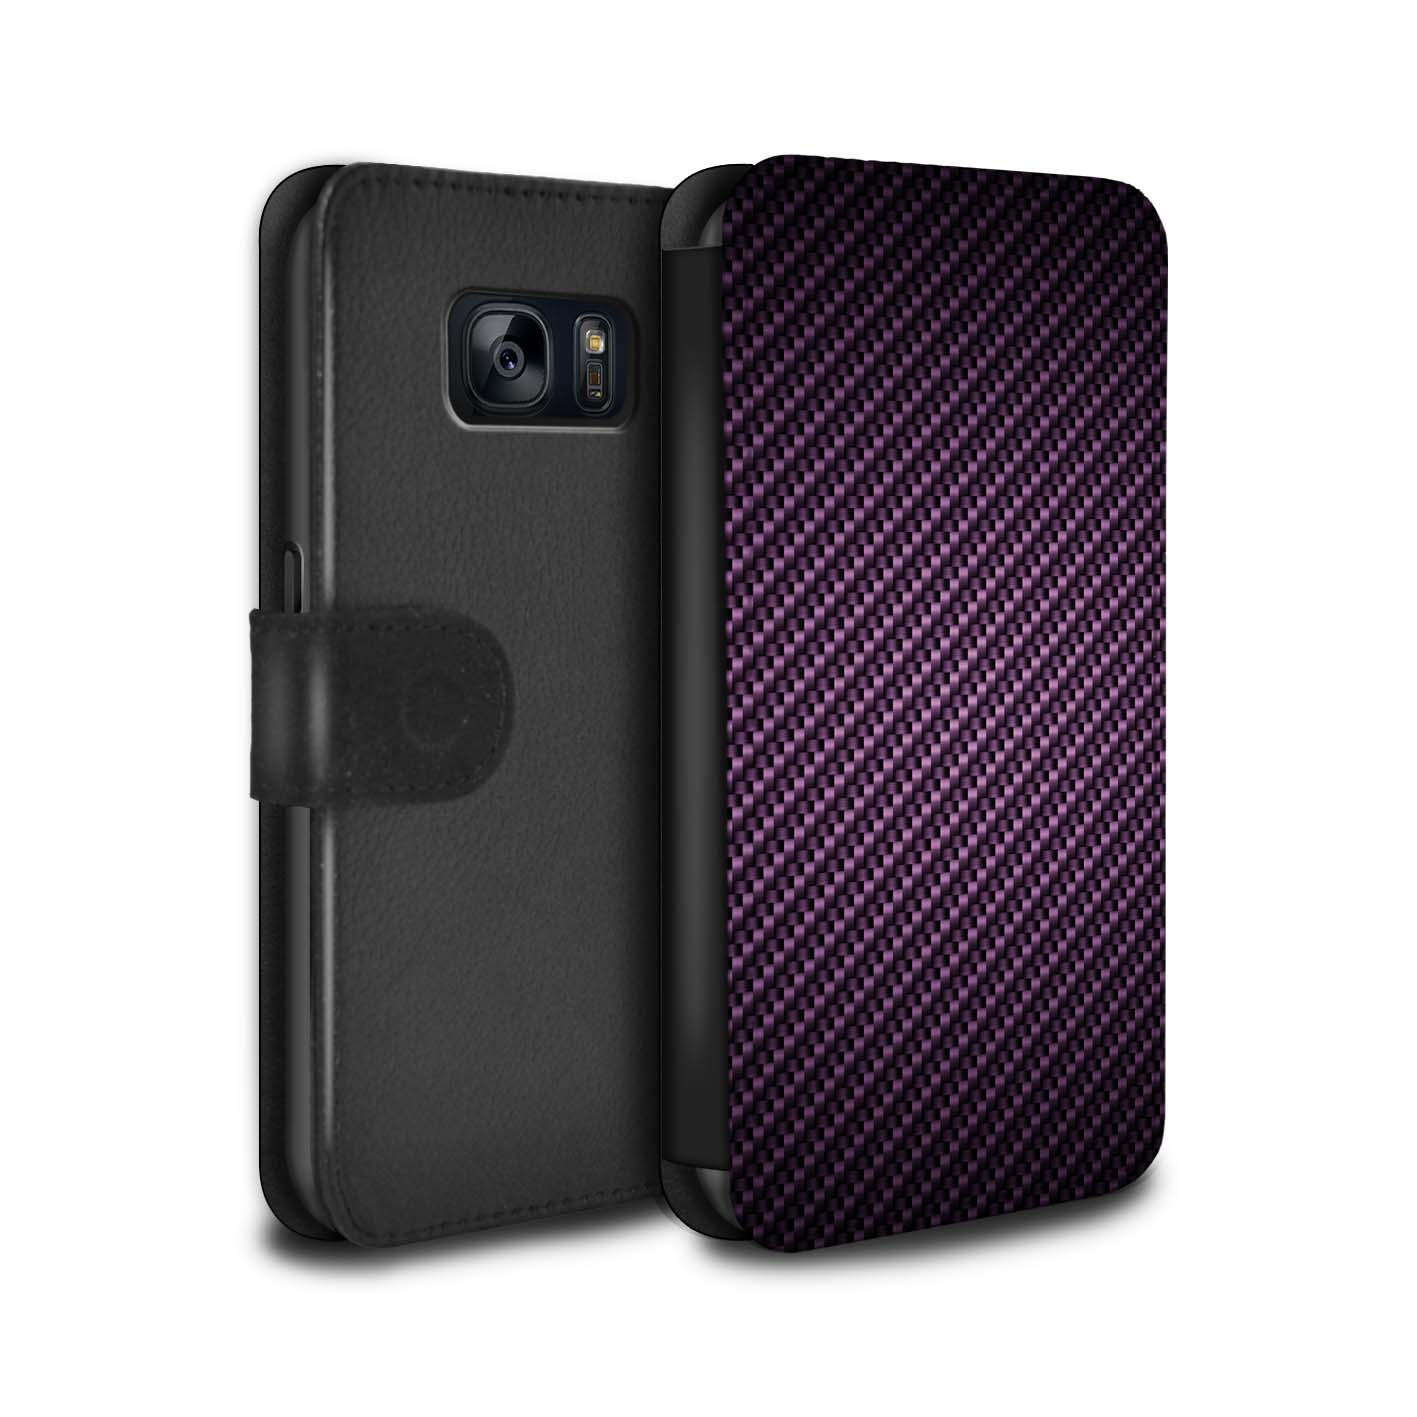 STUFF4-Coque-Etui-Cuir-PU-pour-Samsung-Galaxy-S7-G930-Motif-de-Fibre-de-Carbone